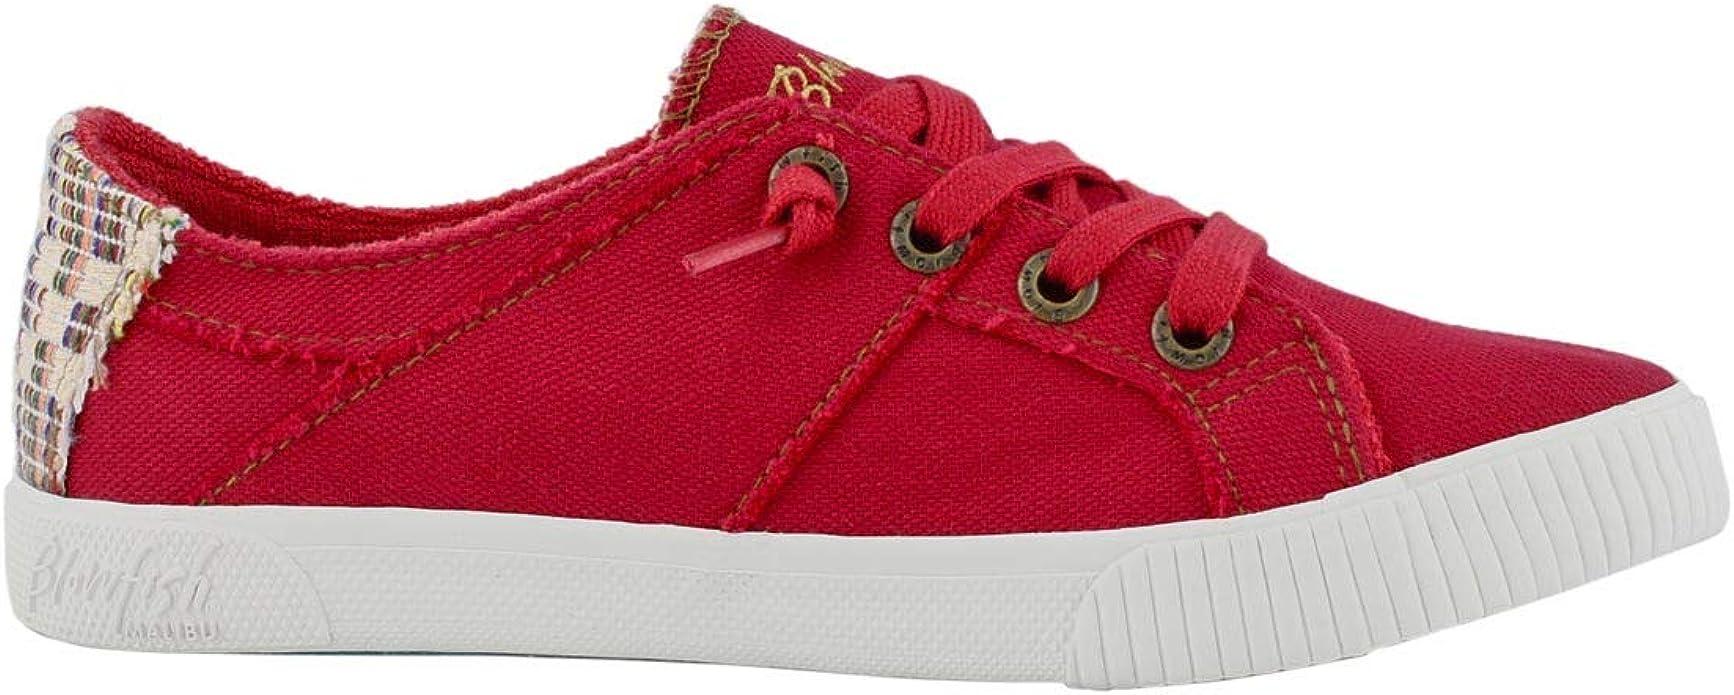 Fruit Fashion Sneaker Jester Red